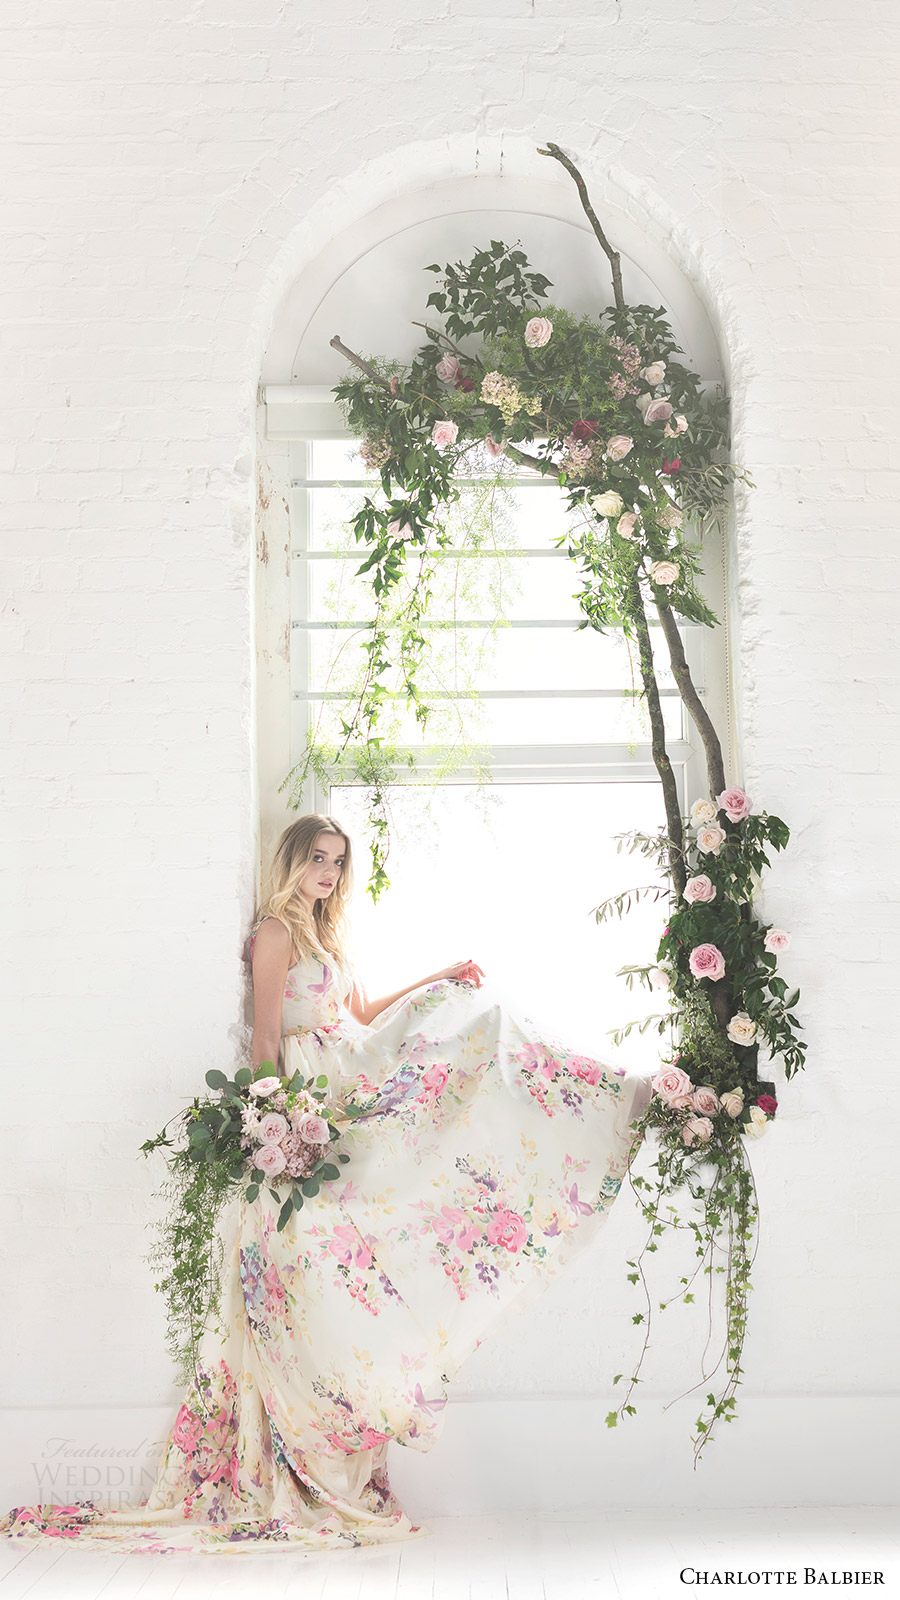 charlotte balbier bridal 2017 sleeveless vneck ball gown wedding dress (untamed love) sv floral print multicolor